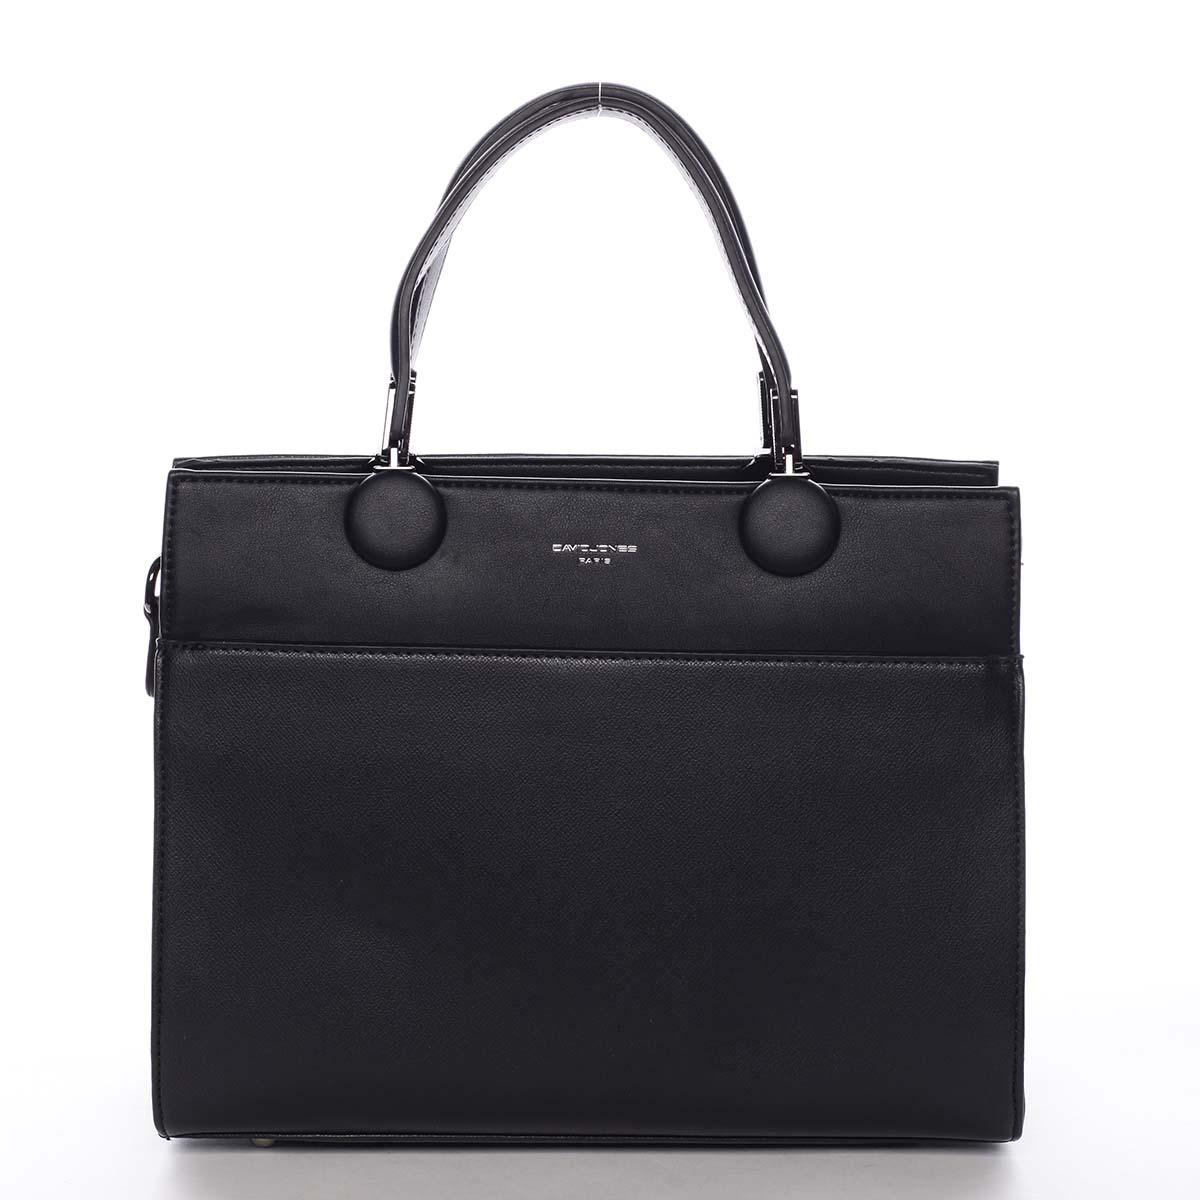 Dámska kabelka do ruky čierna - David Jones Edma čierna